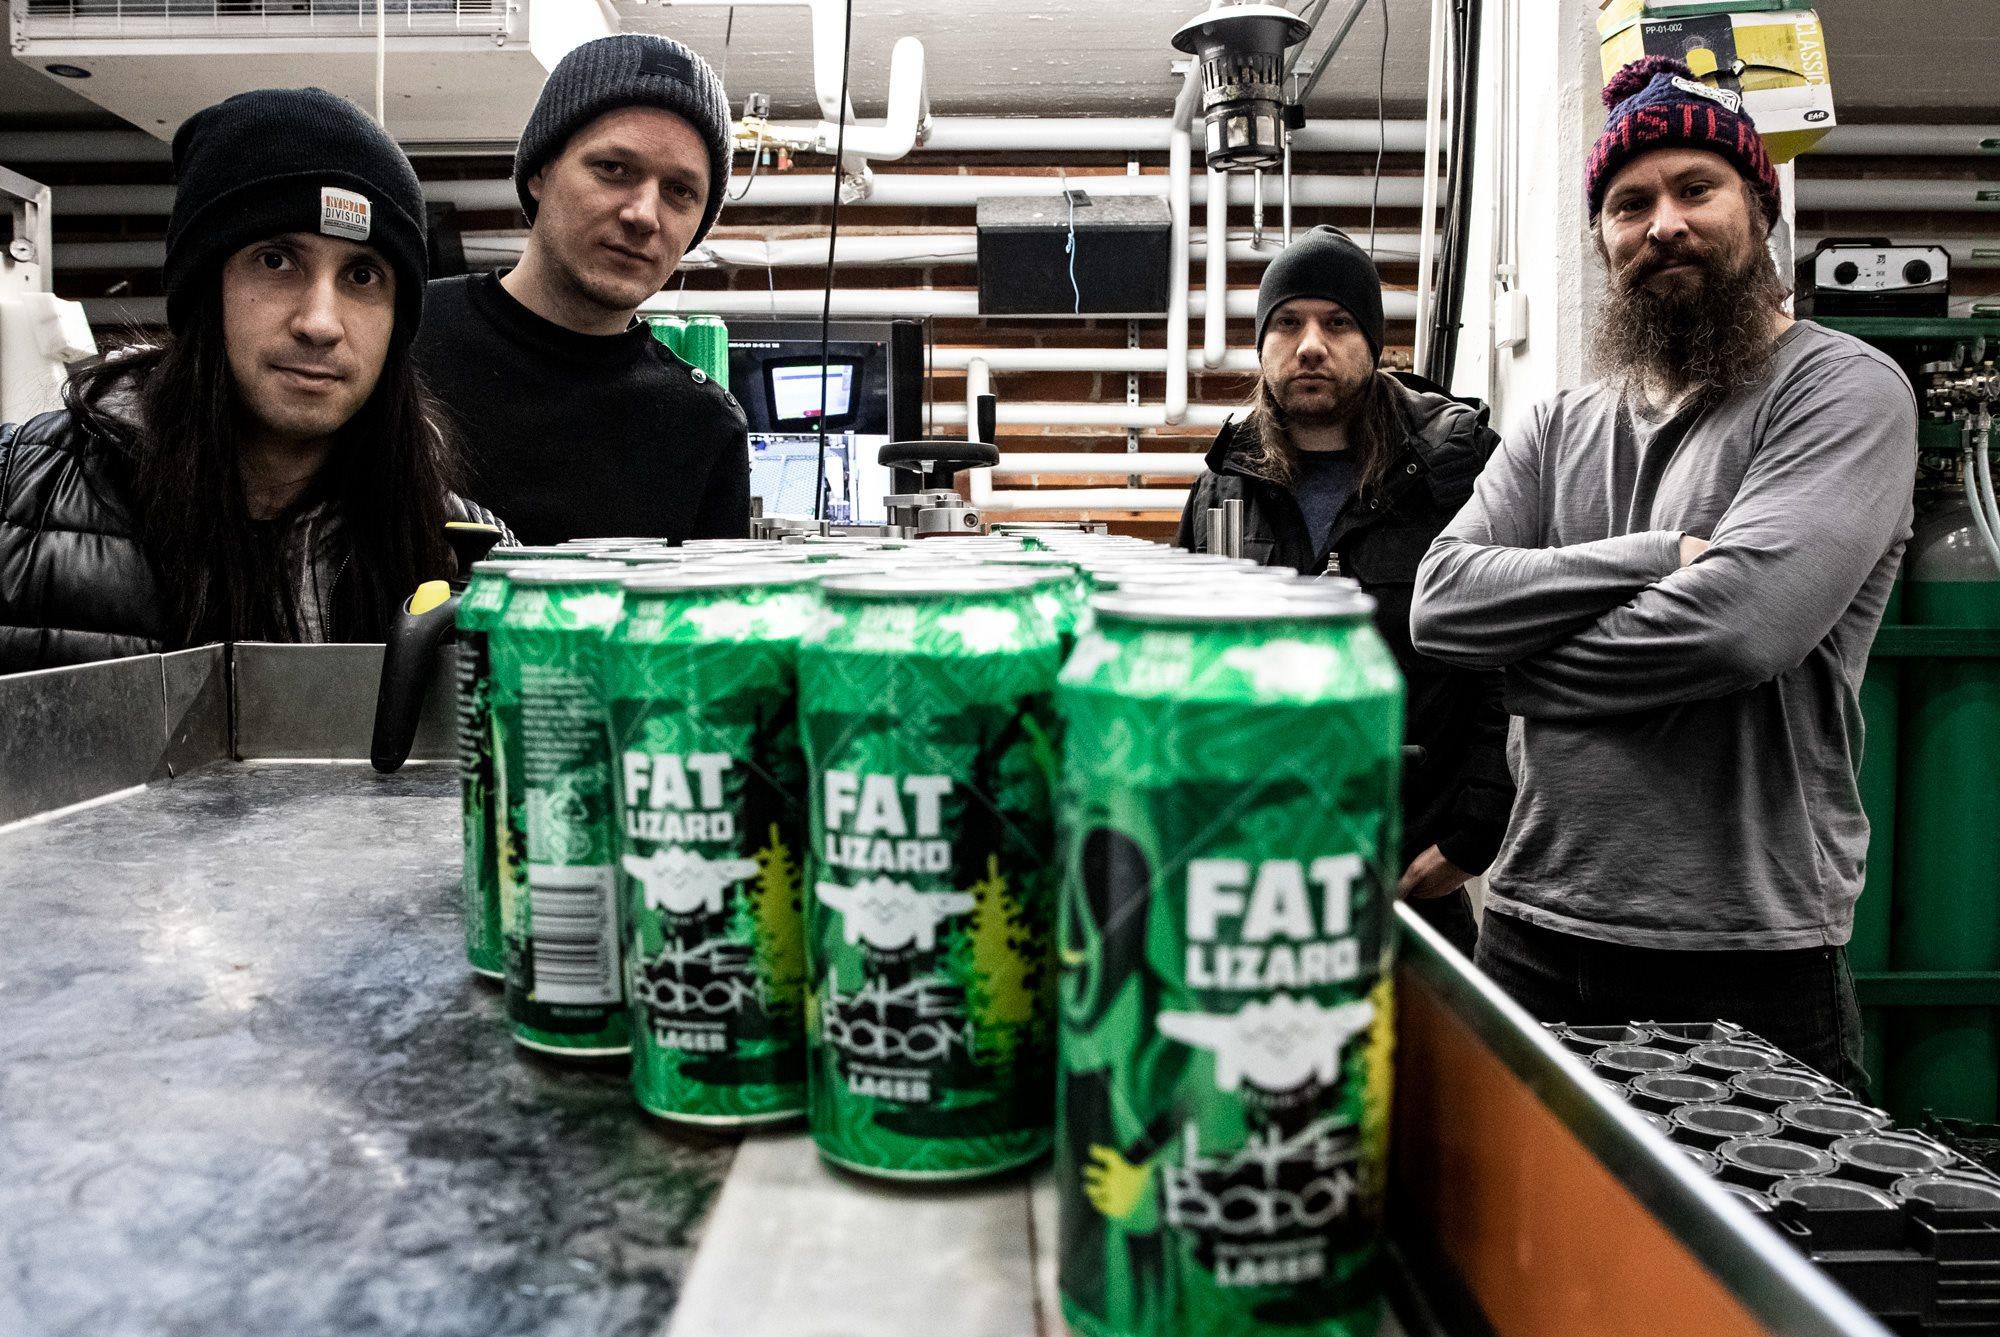 Fat Lizard Lake Bodom Lager